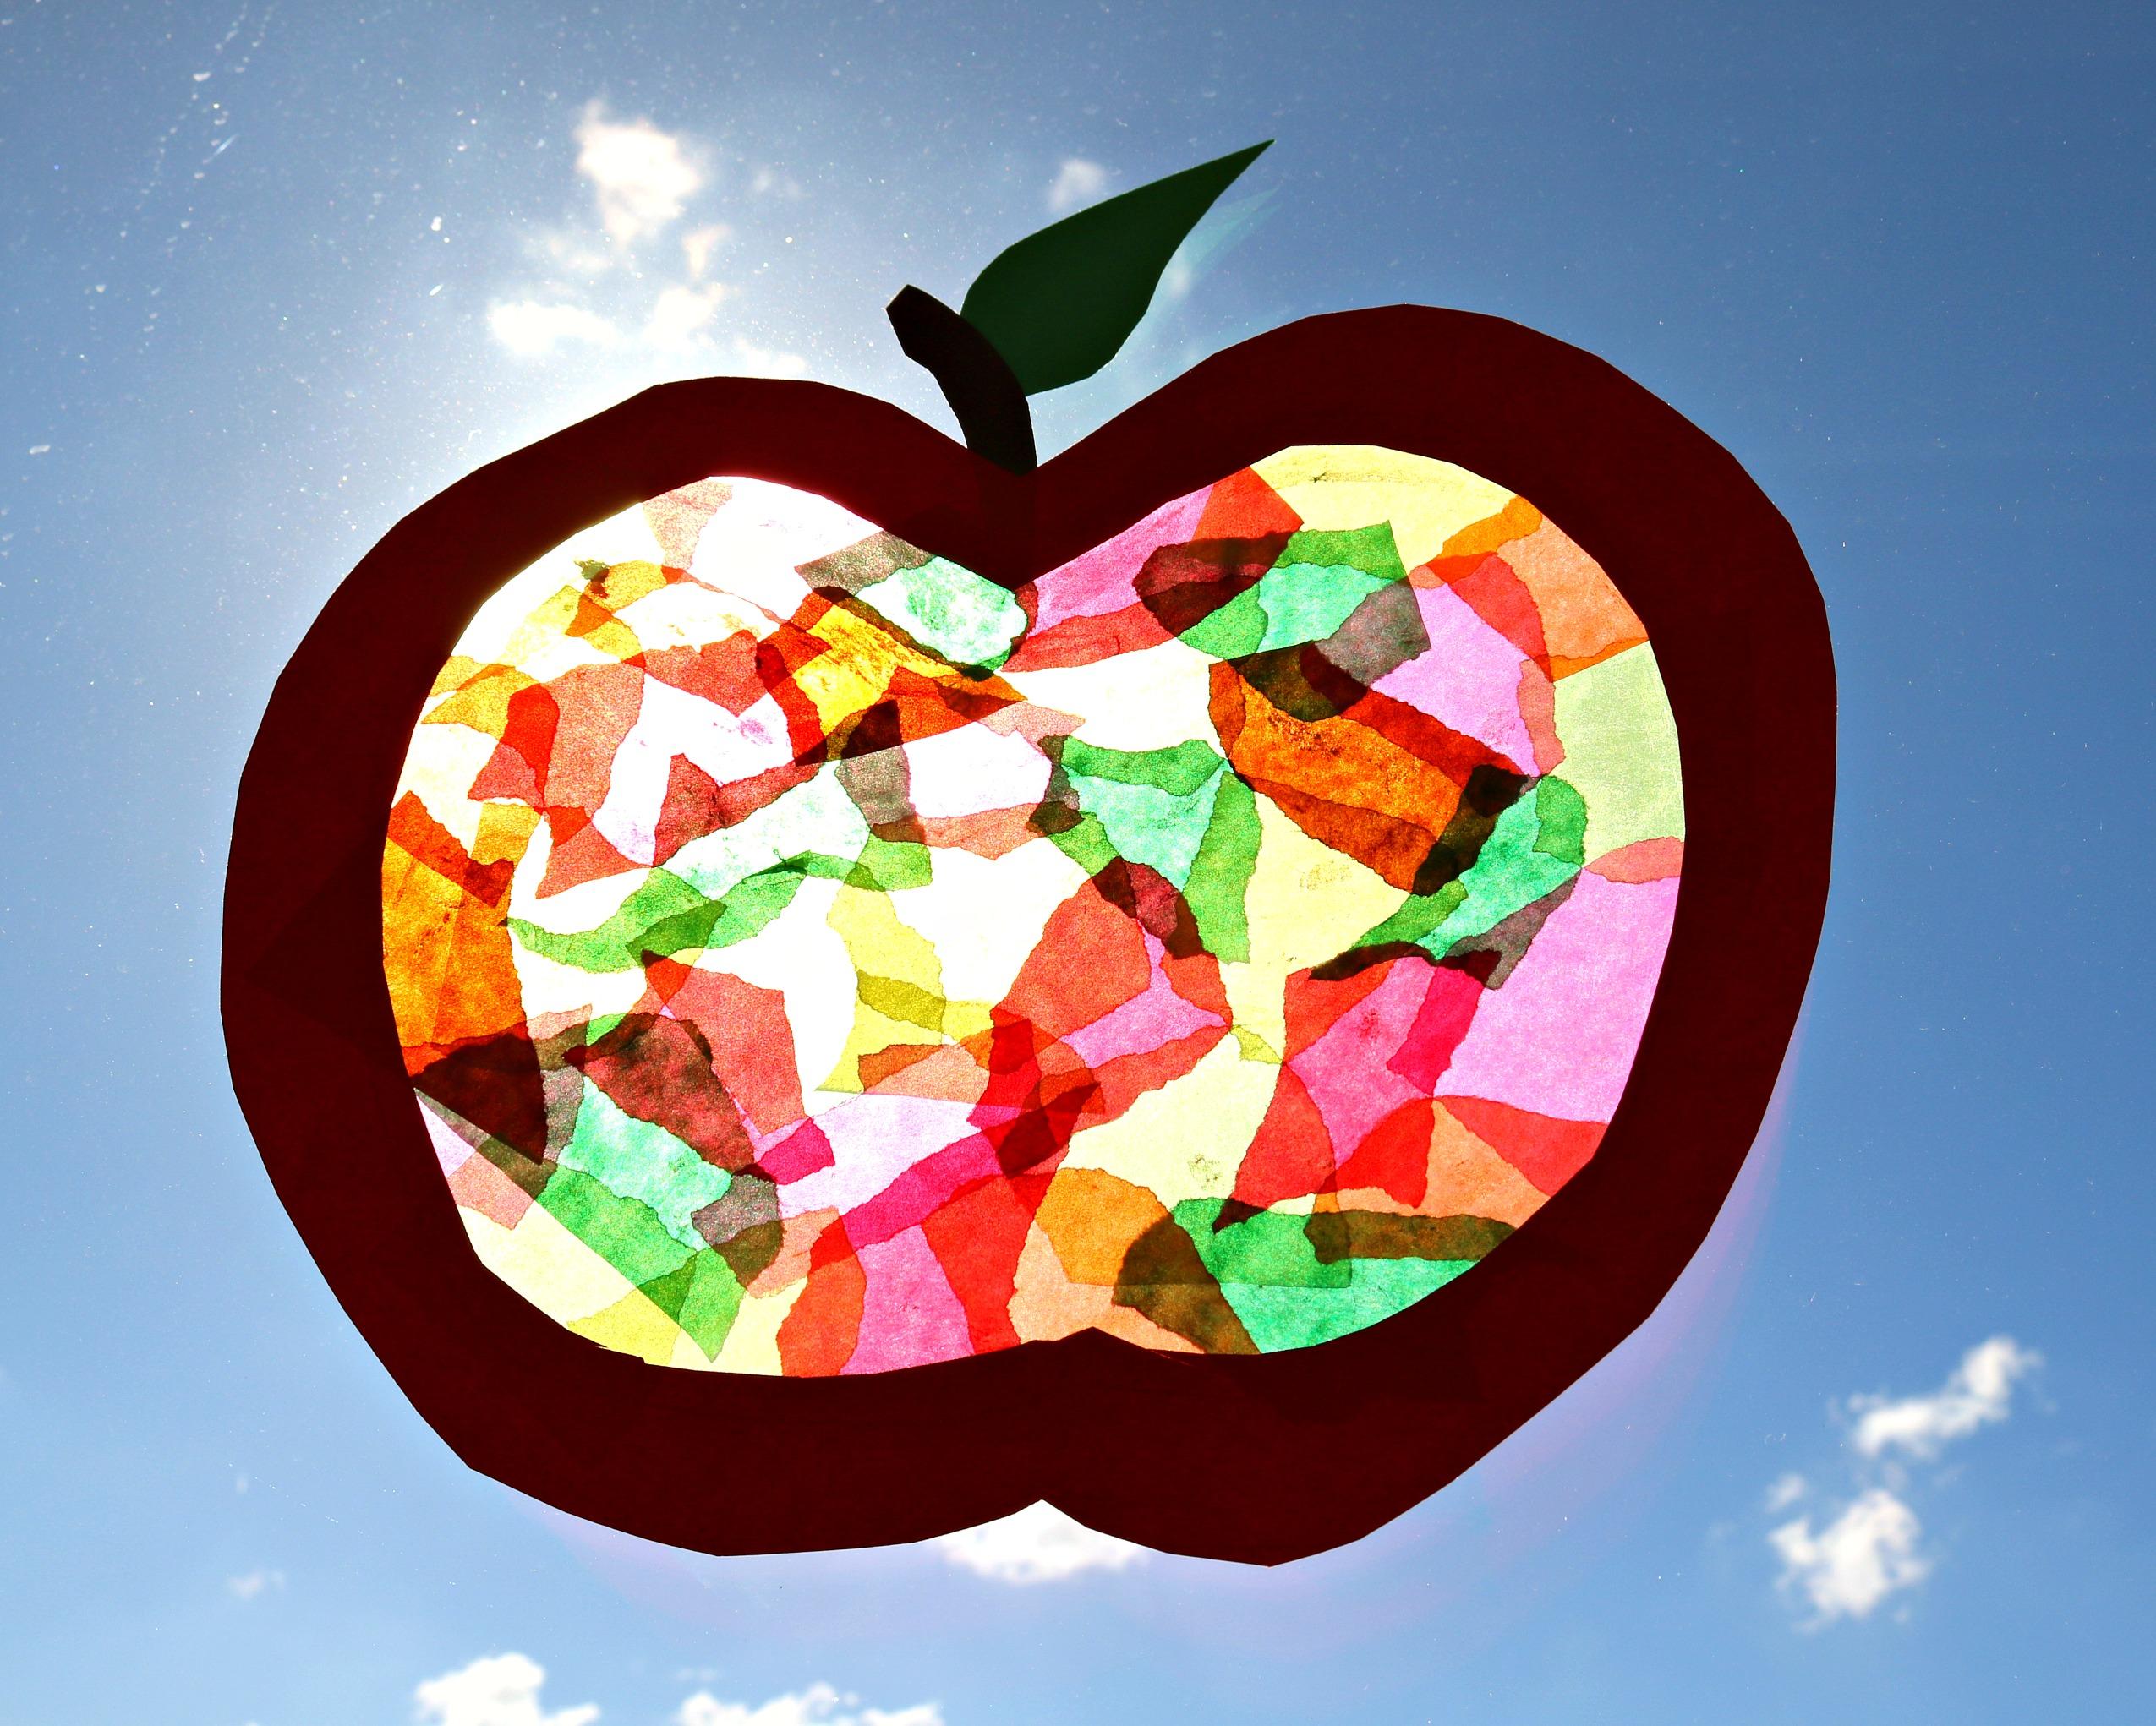 Apfelfensterbild